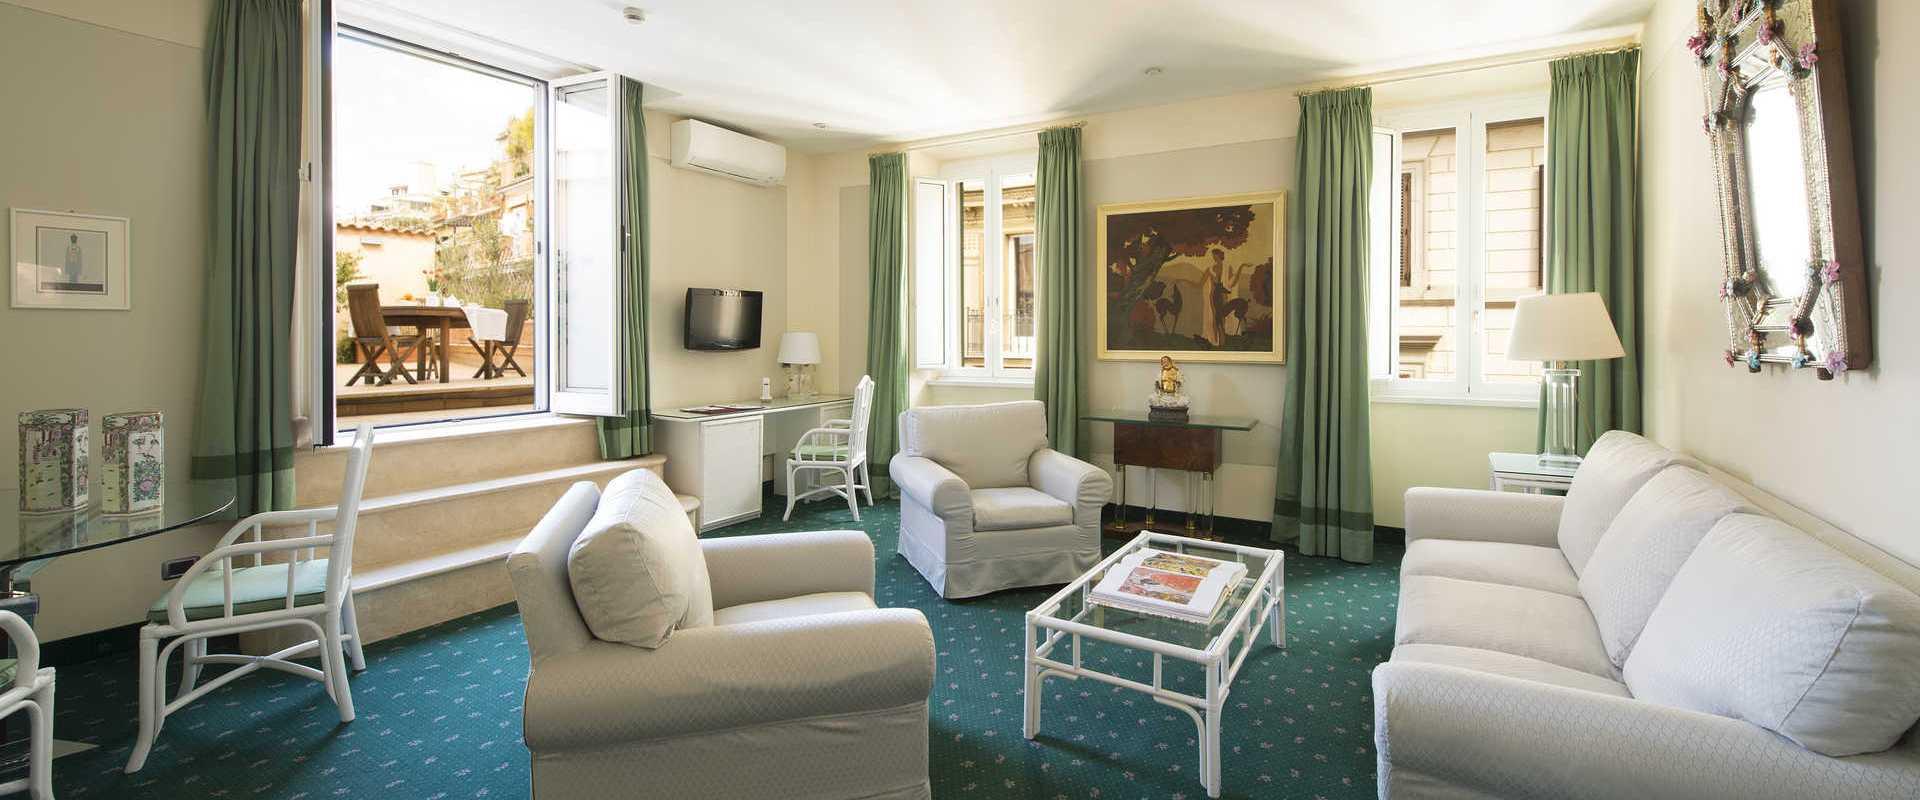 Suite Hotel Gregoriana Tre Stelle Roma Centro